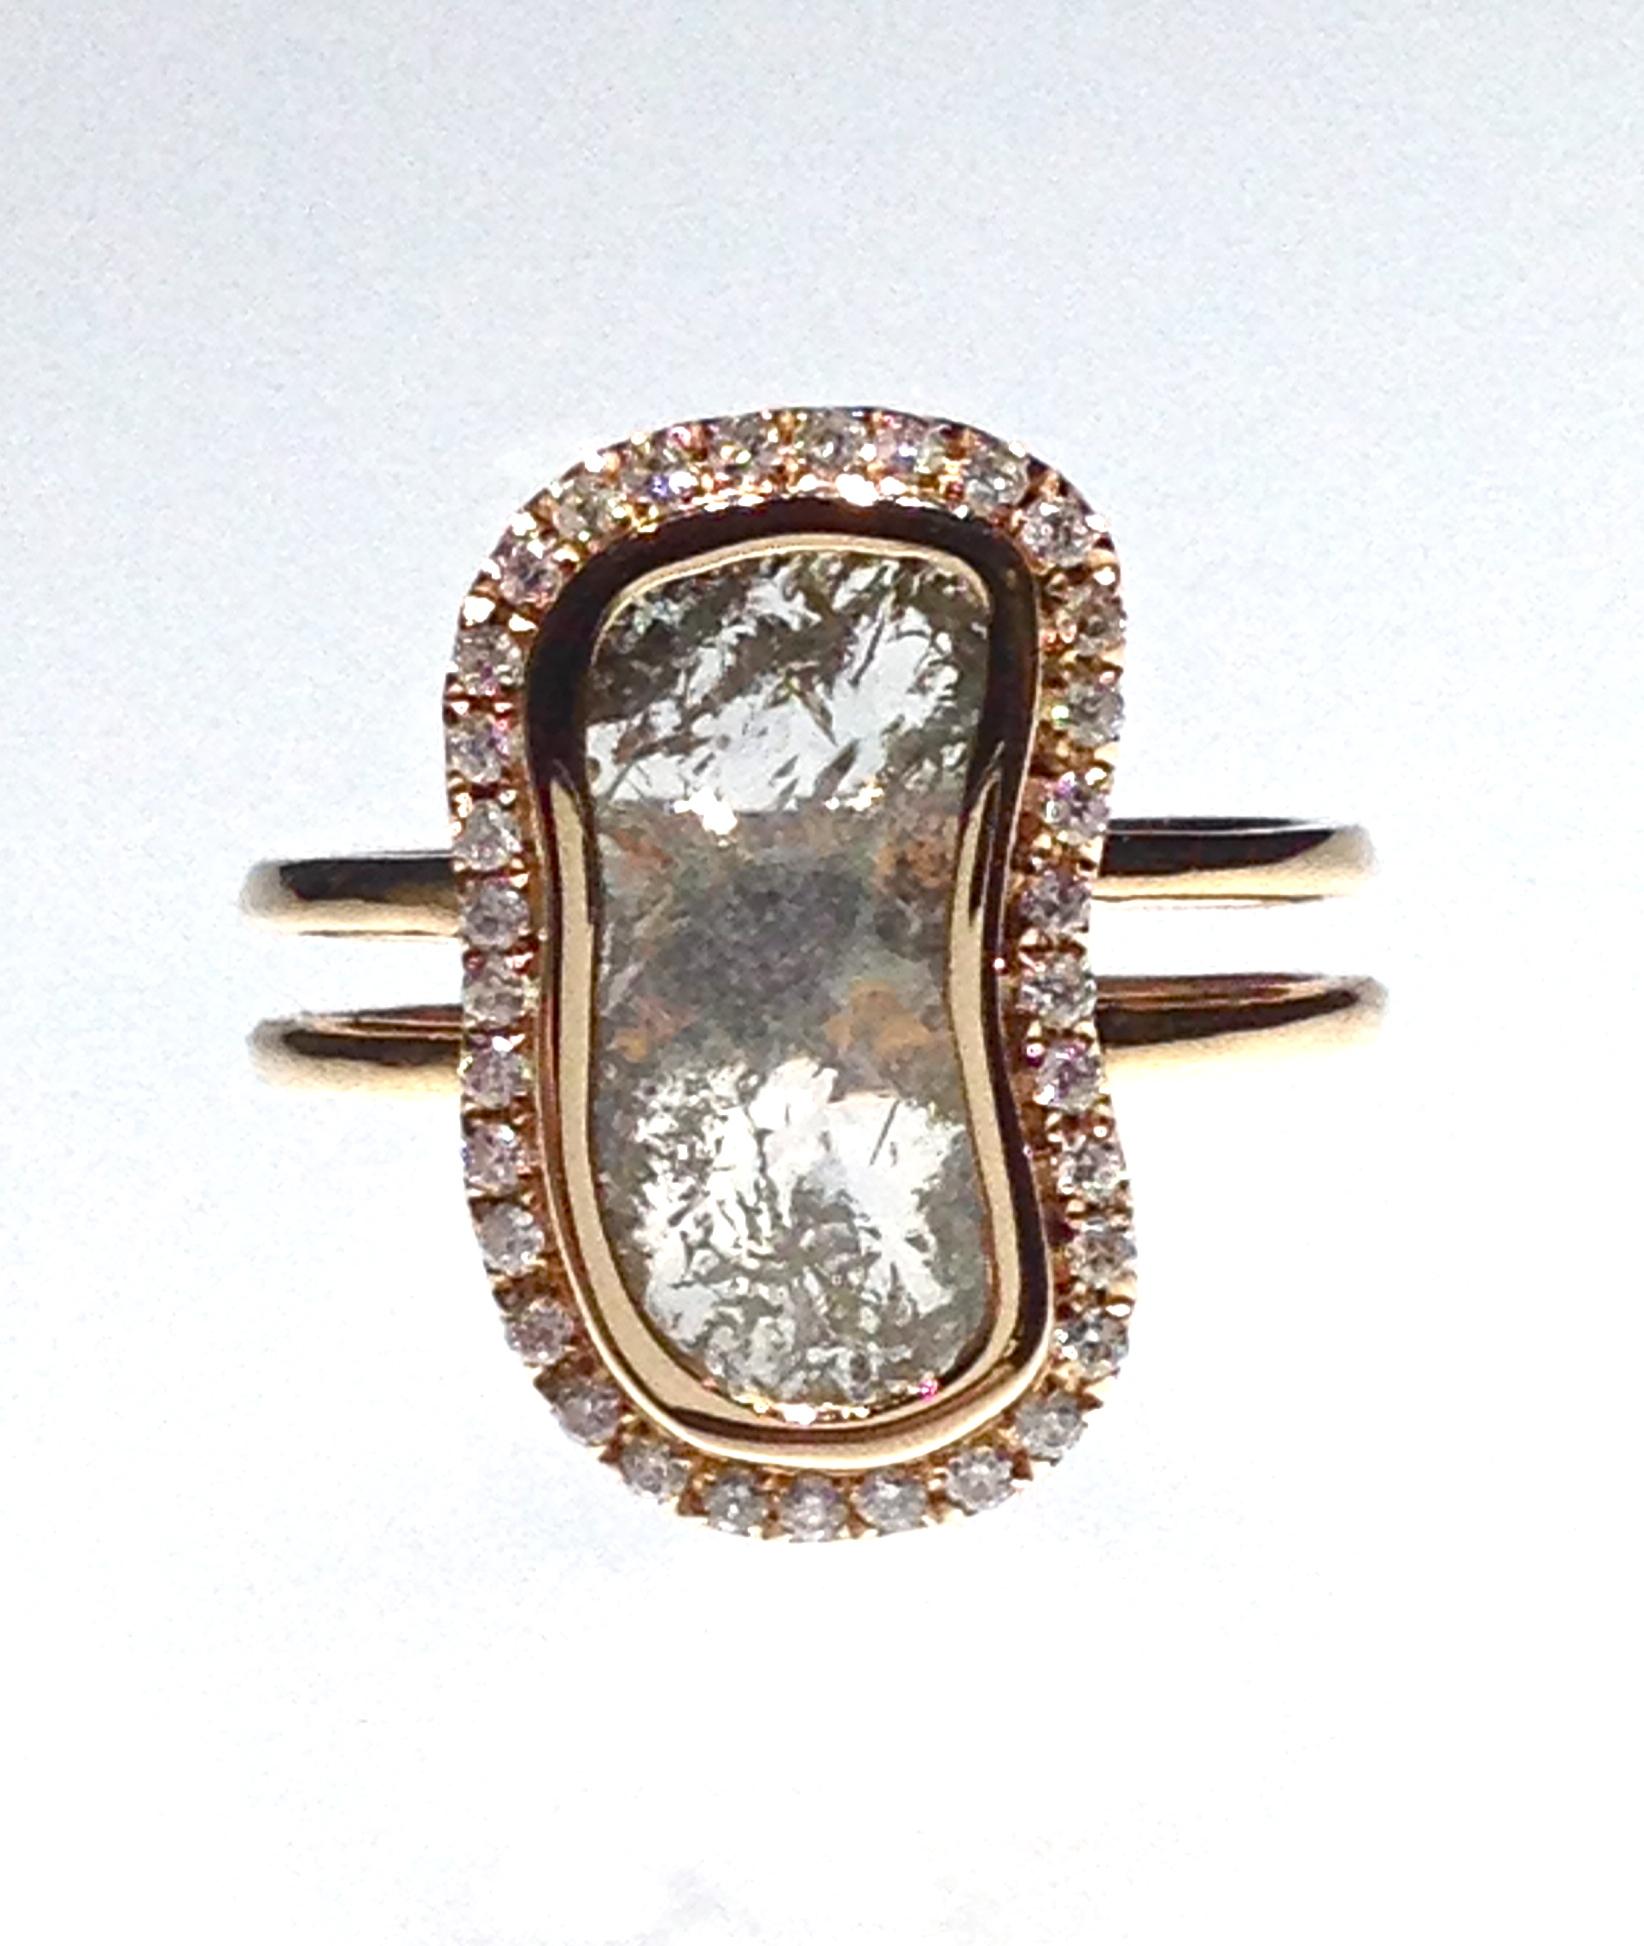 unique-ladies-gold-diamond-slice-raw-diamond-engagement-ring-craft-revival-jewelry-store-grand-rapids